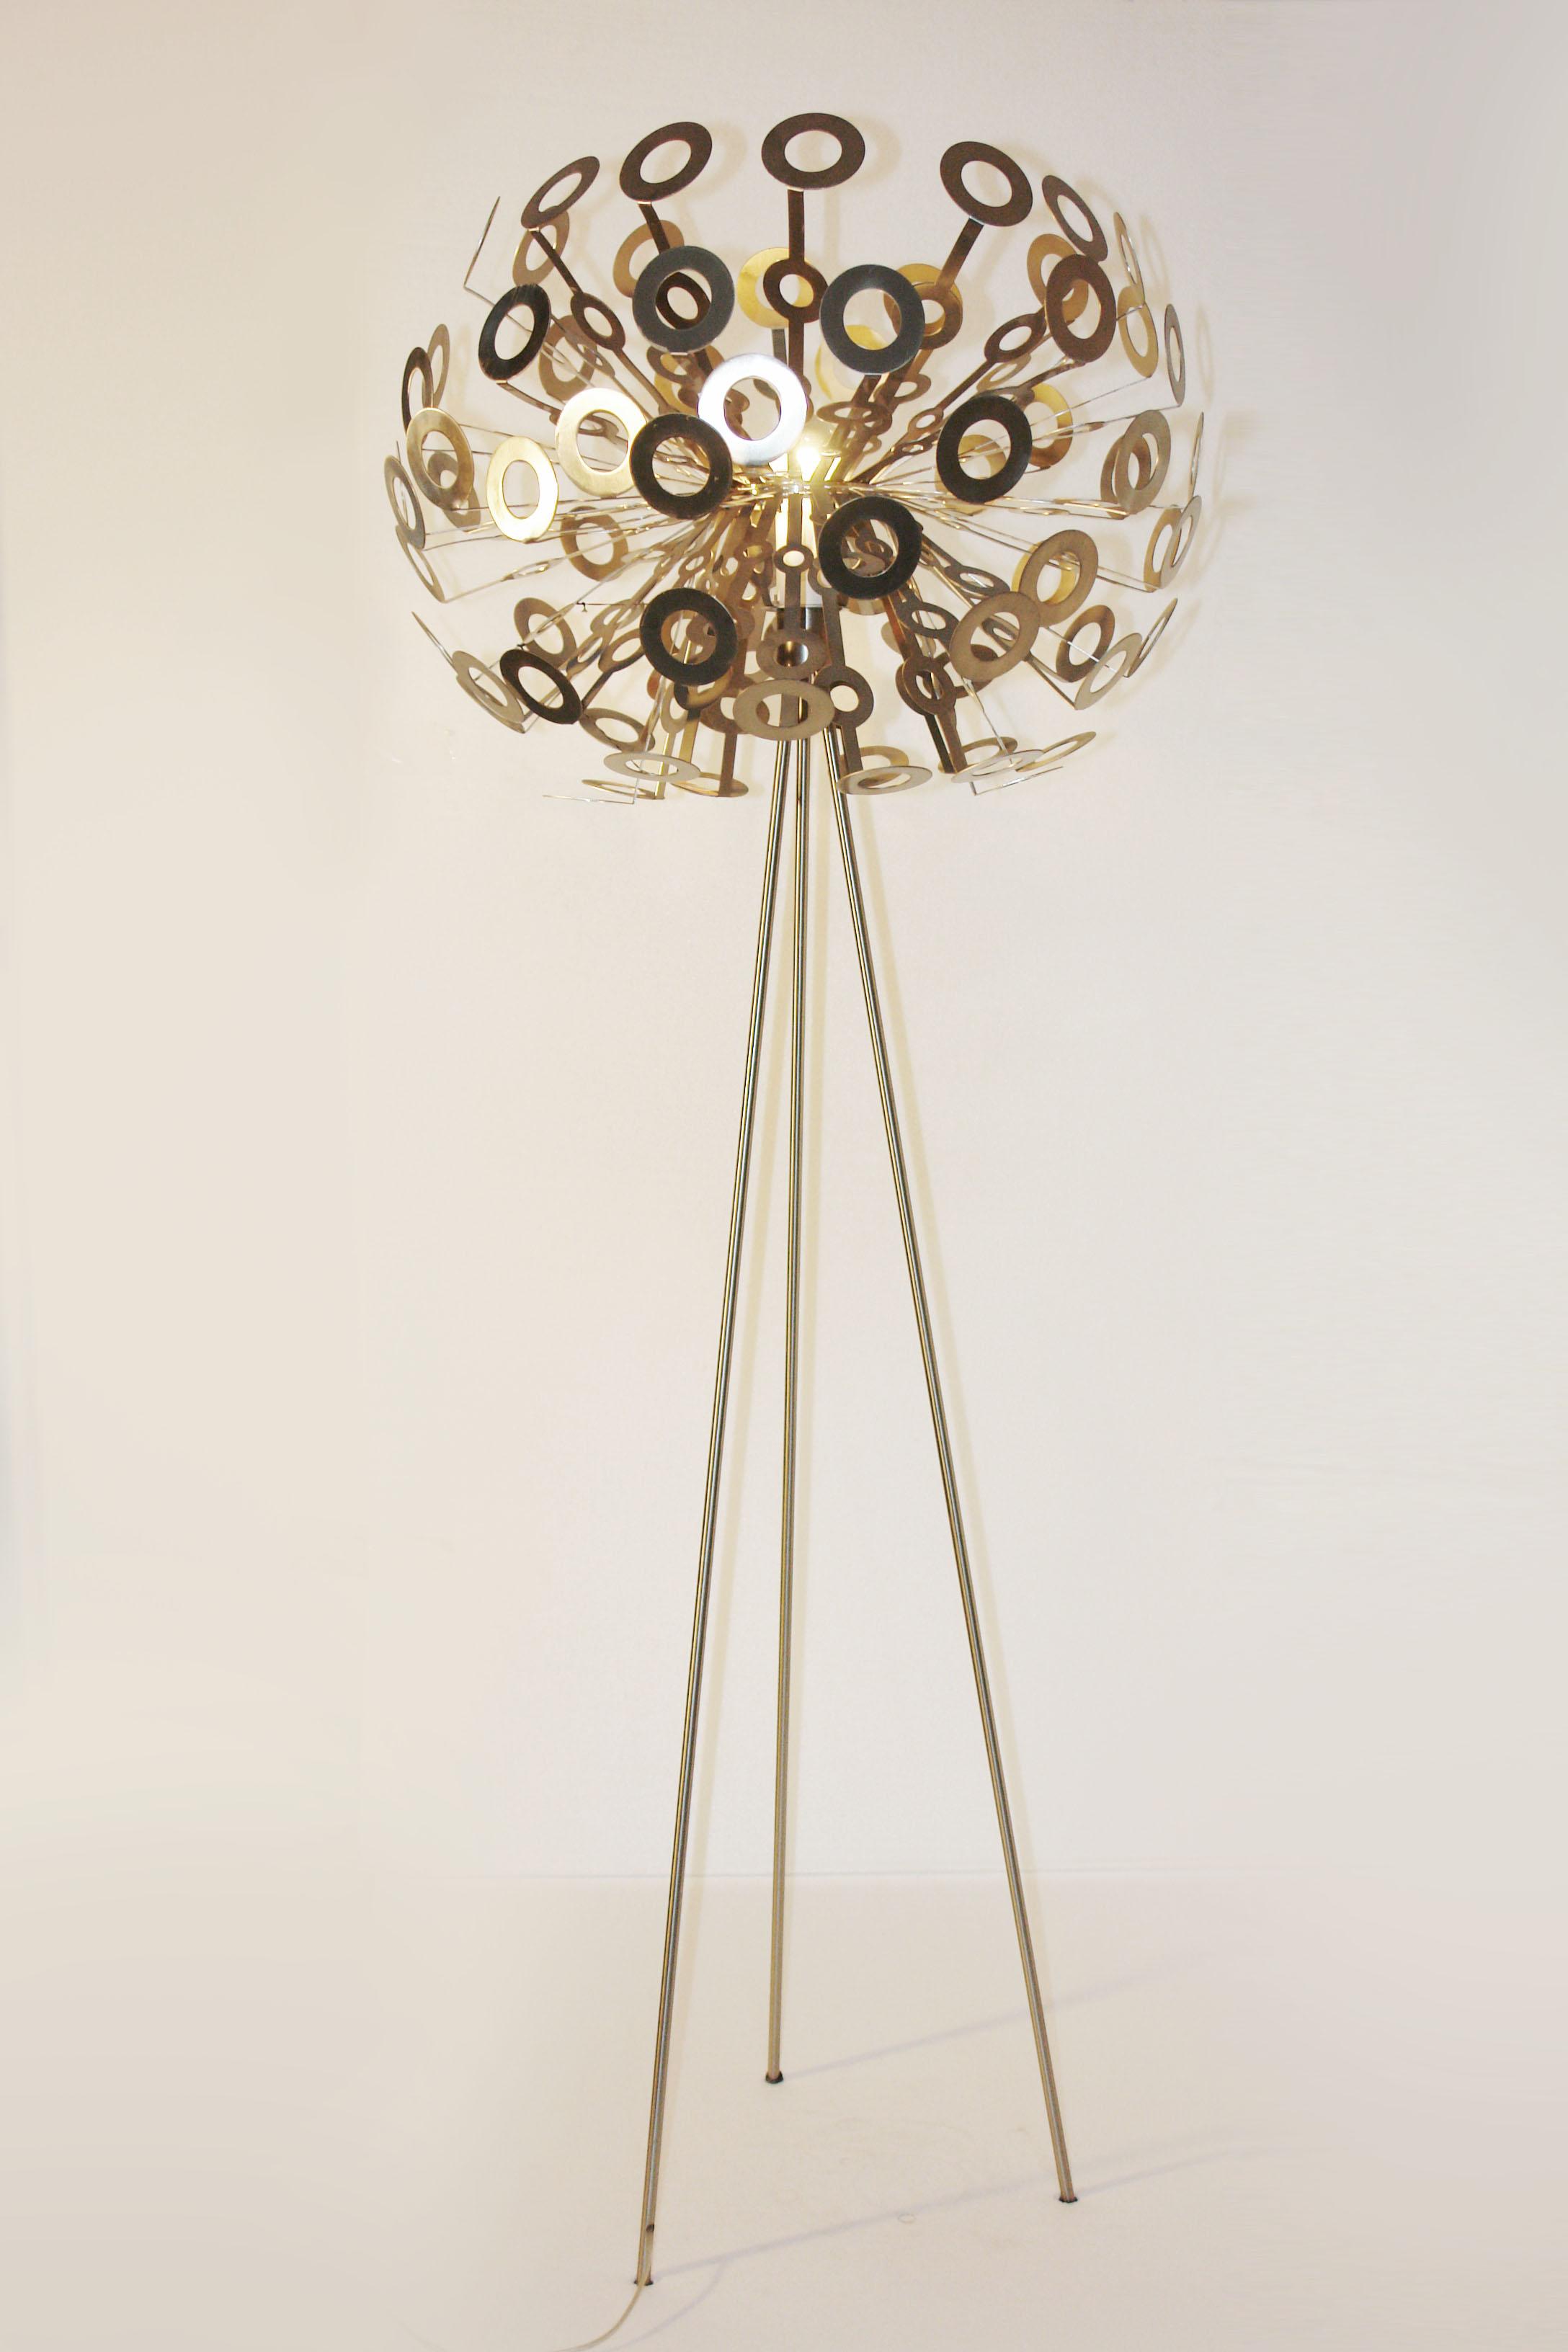 dandelion hutten 39 style 39 tripod floor lamp light retro smarty lamps. Black Bedroom Furniture Sets. Home Design Ideas